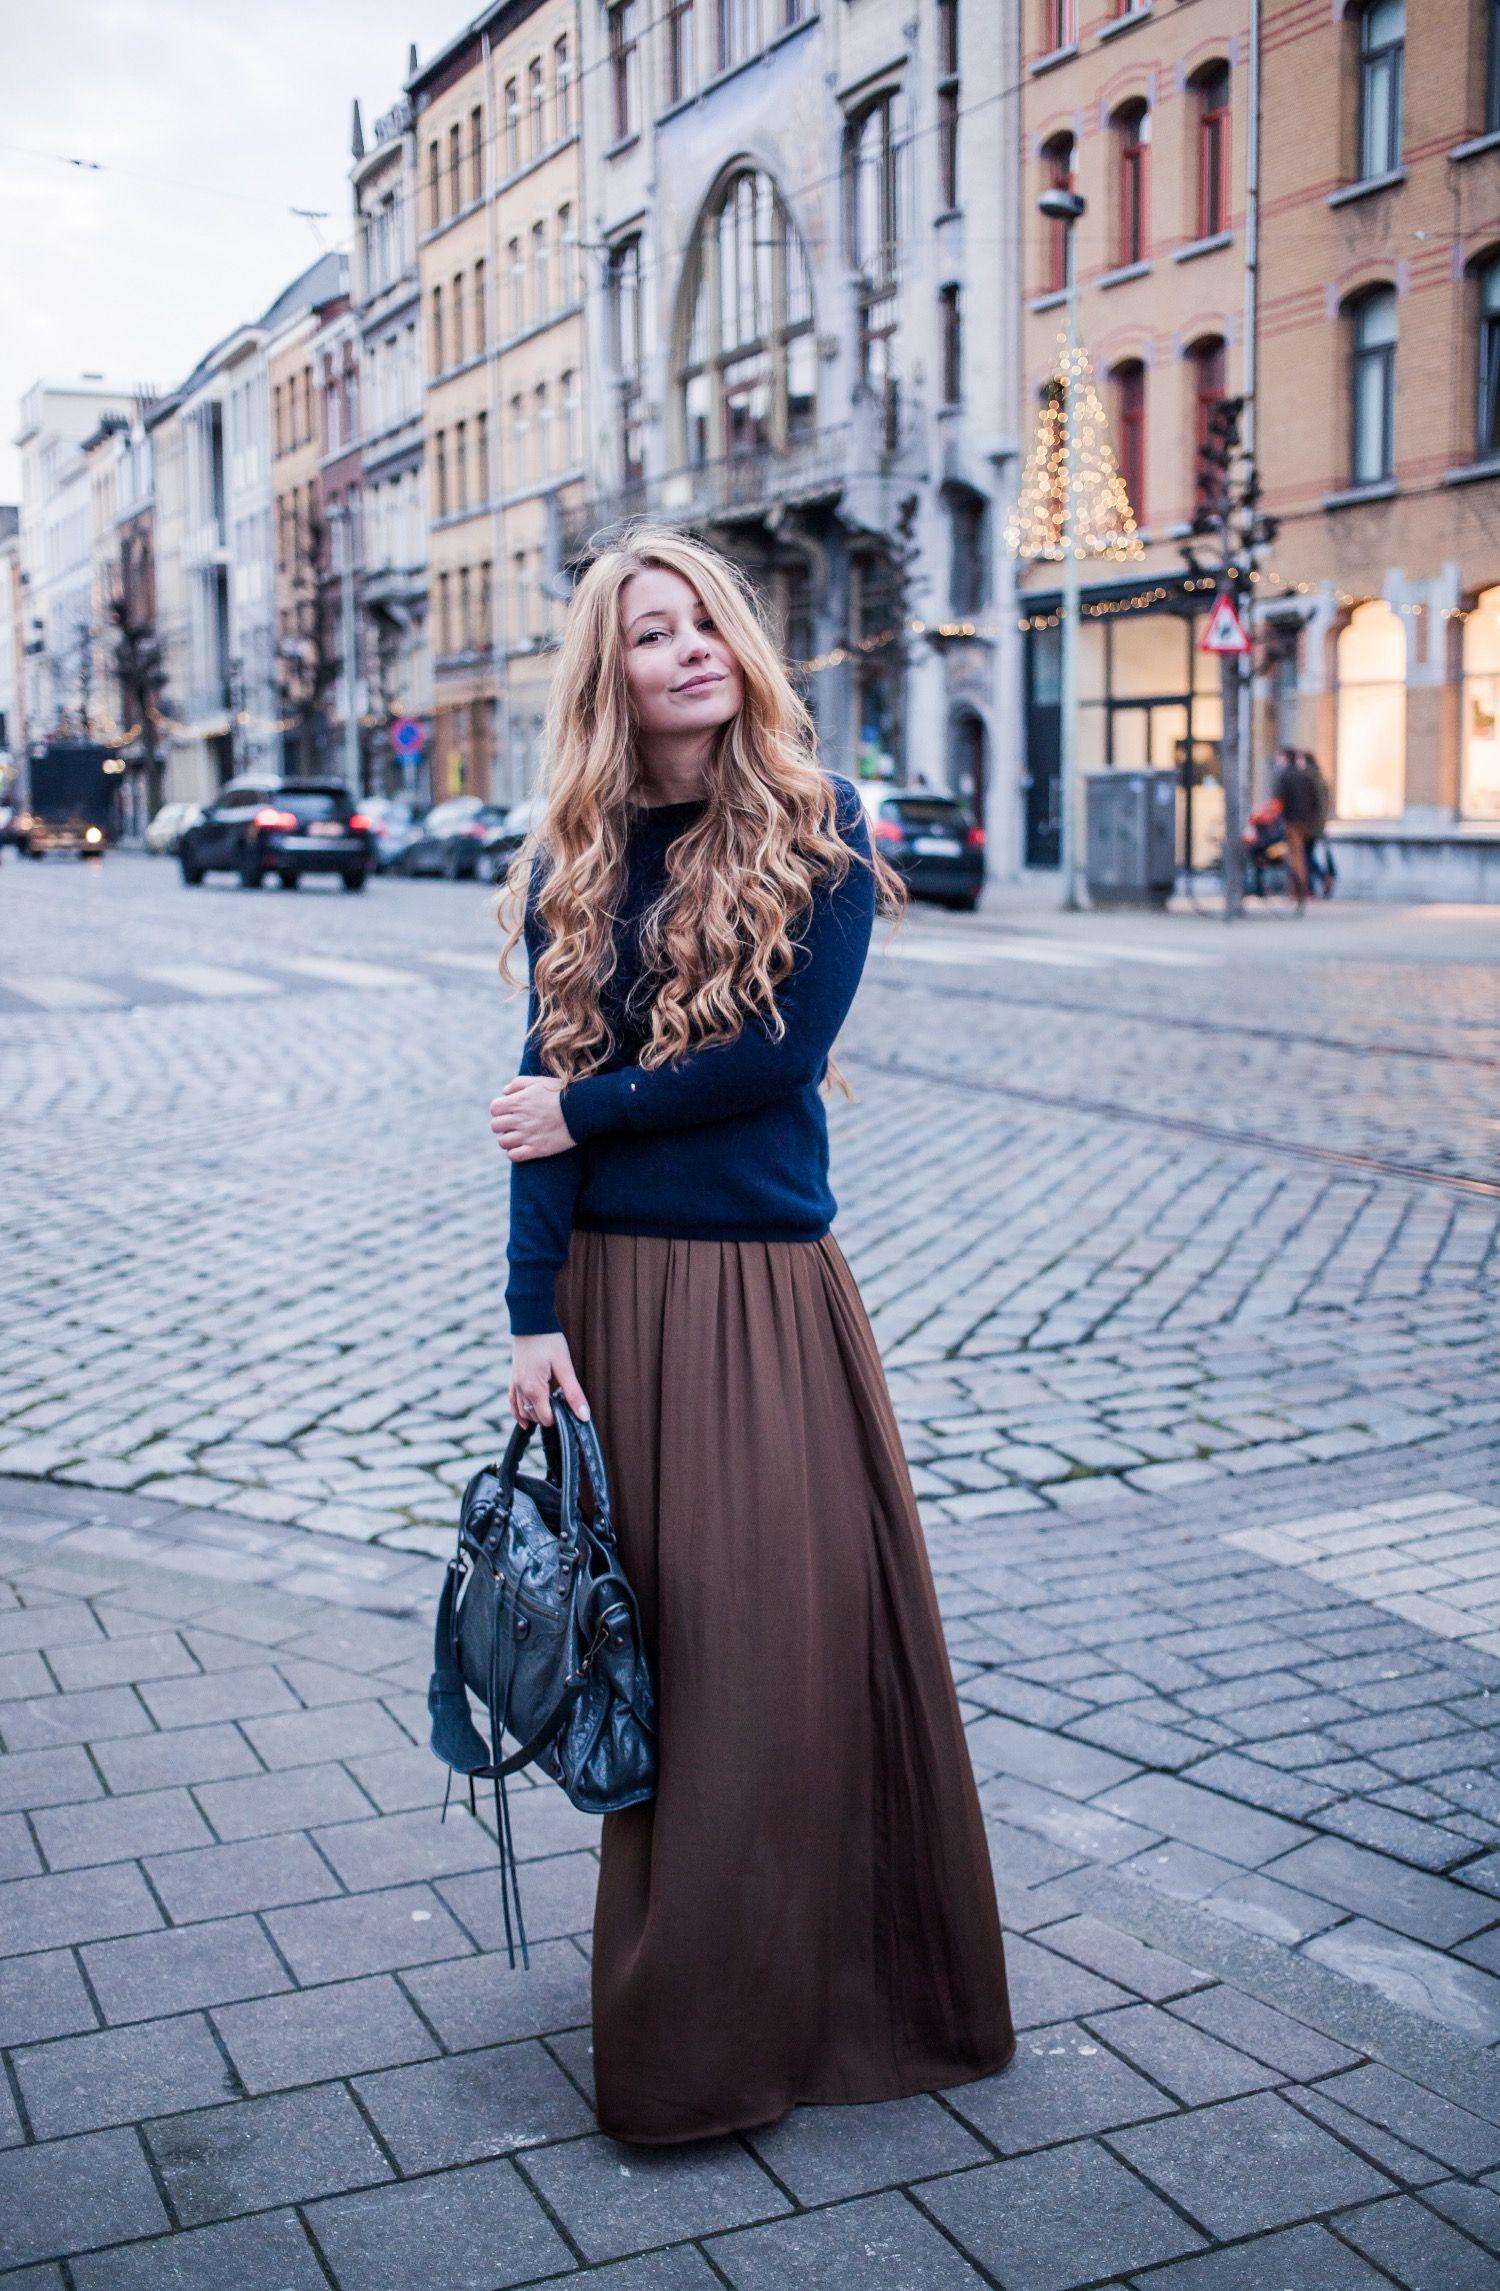 Maxi Skirts On Monday Stylish Maxi Skirts Maxi Skirt Outfits Brown Maxi Skirts [ 2291 x 1500 Pixel ]